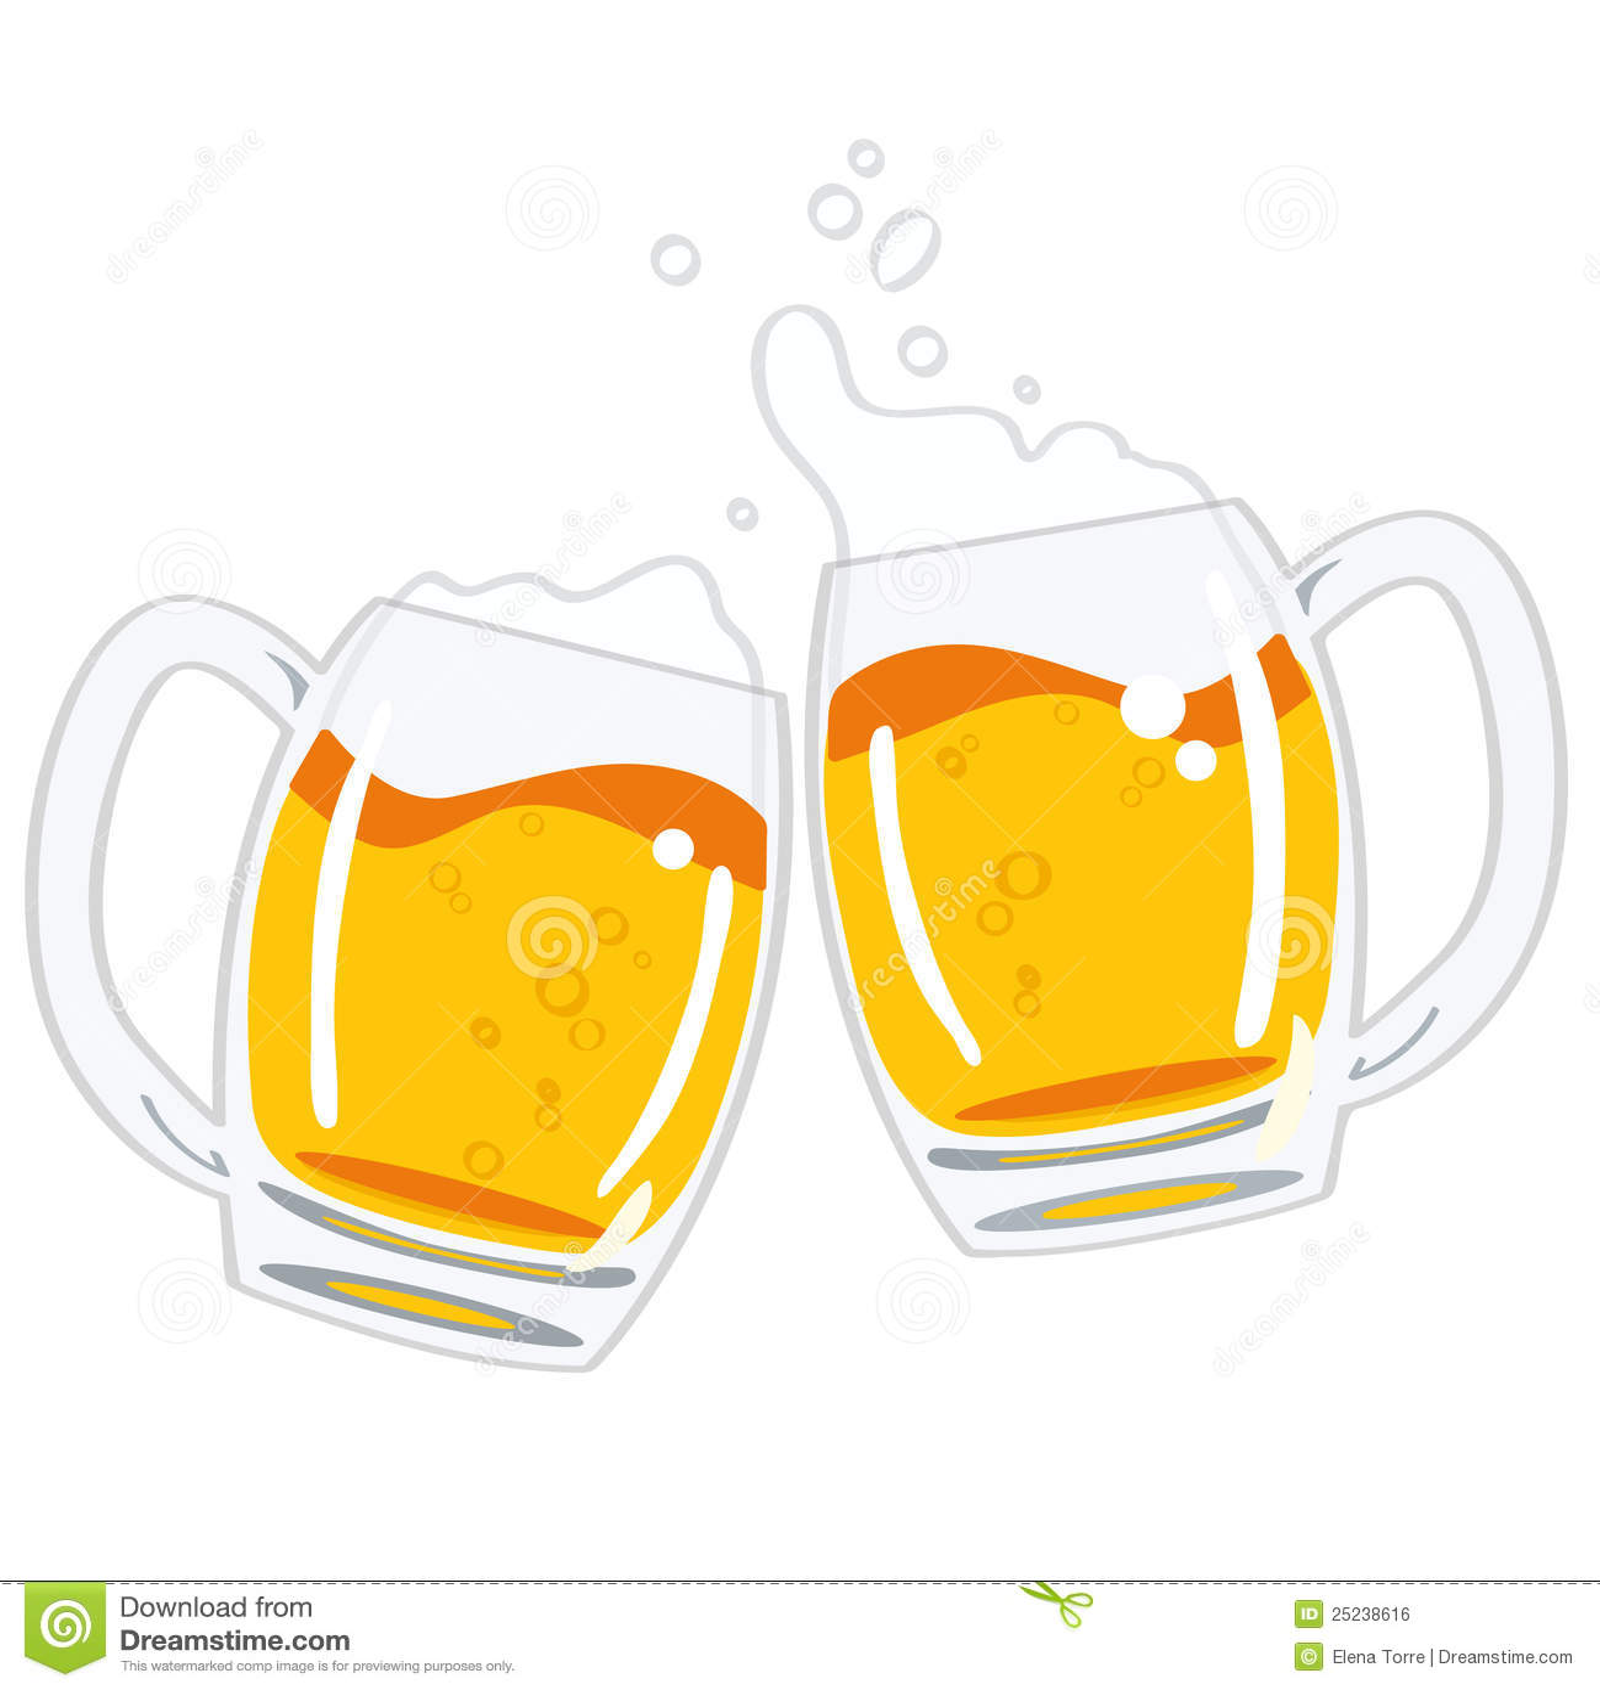 Animated Beer Cheers - Viewing Gallery Animated Beer Cheers